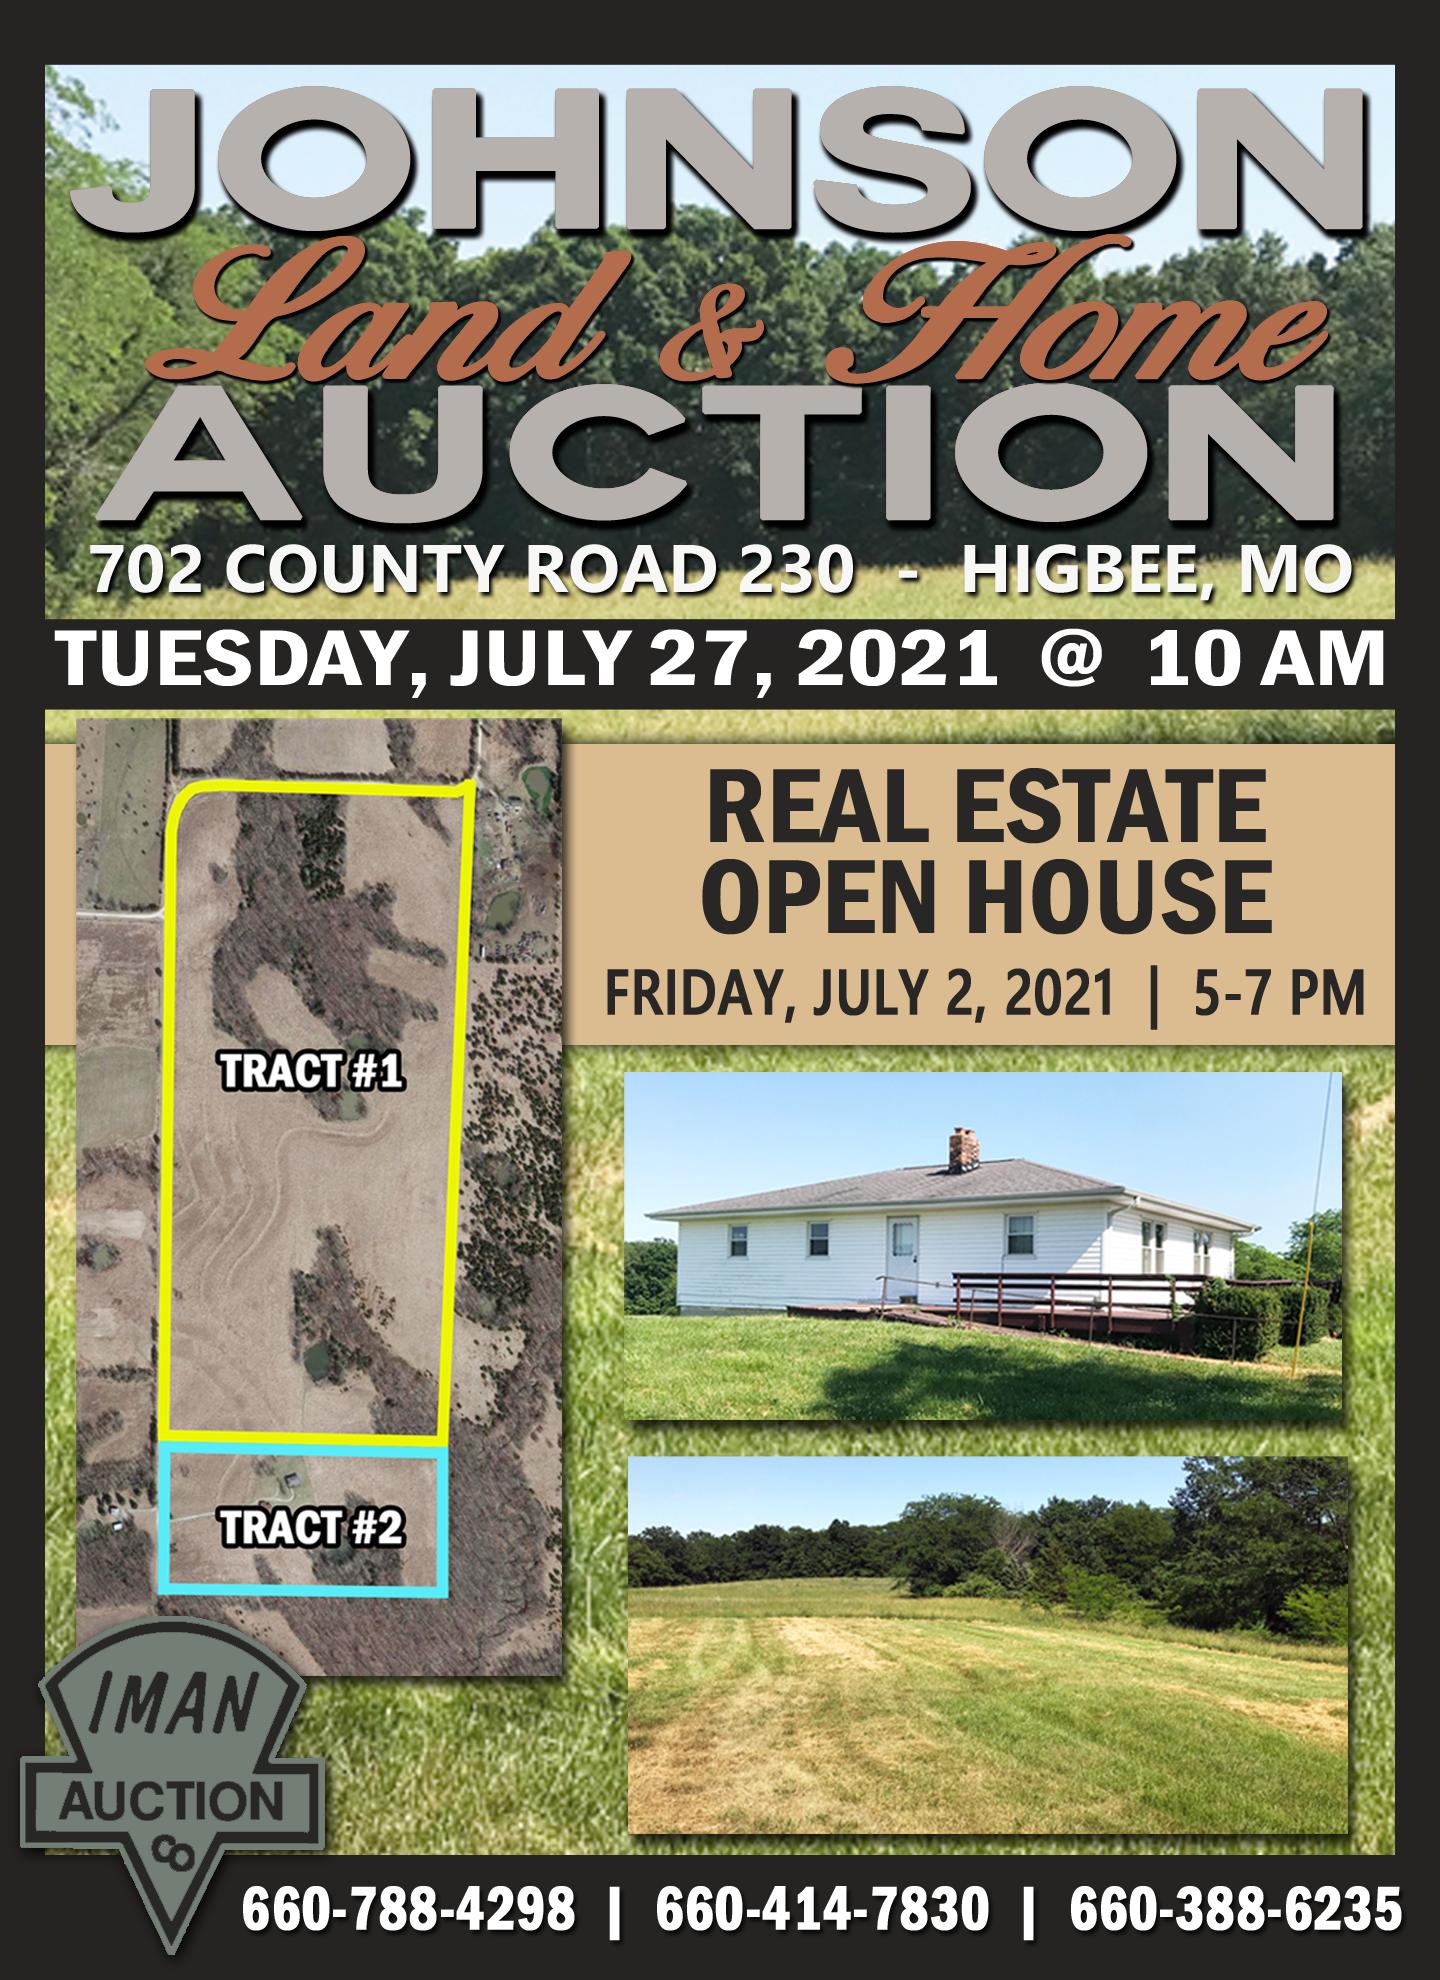 JOHNSON LAND & HOME AUCTION